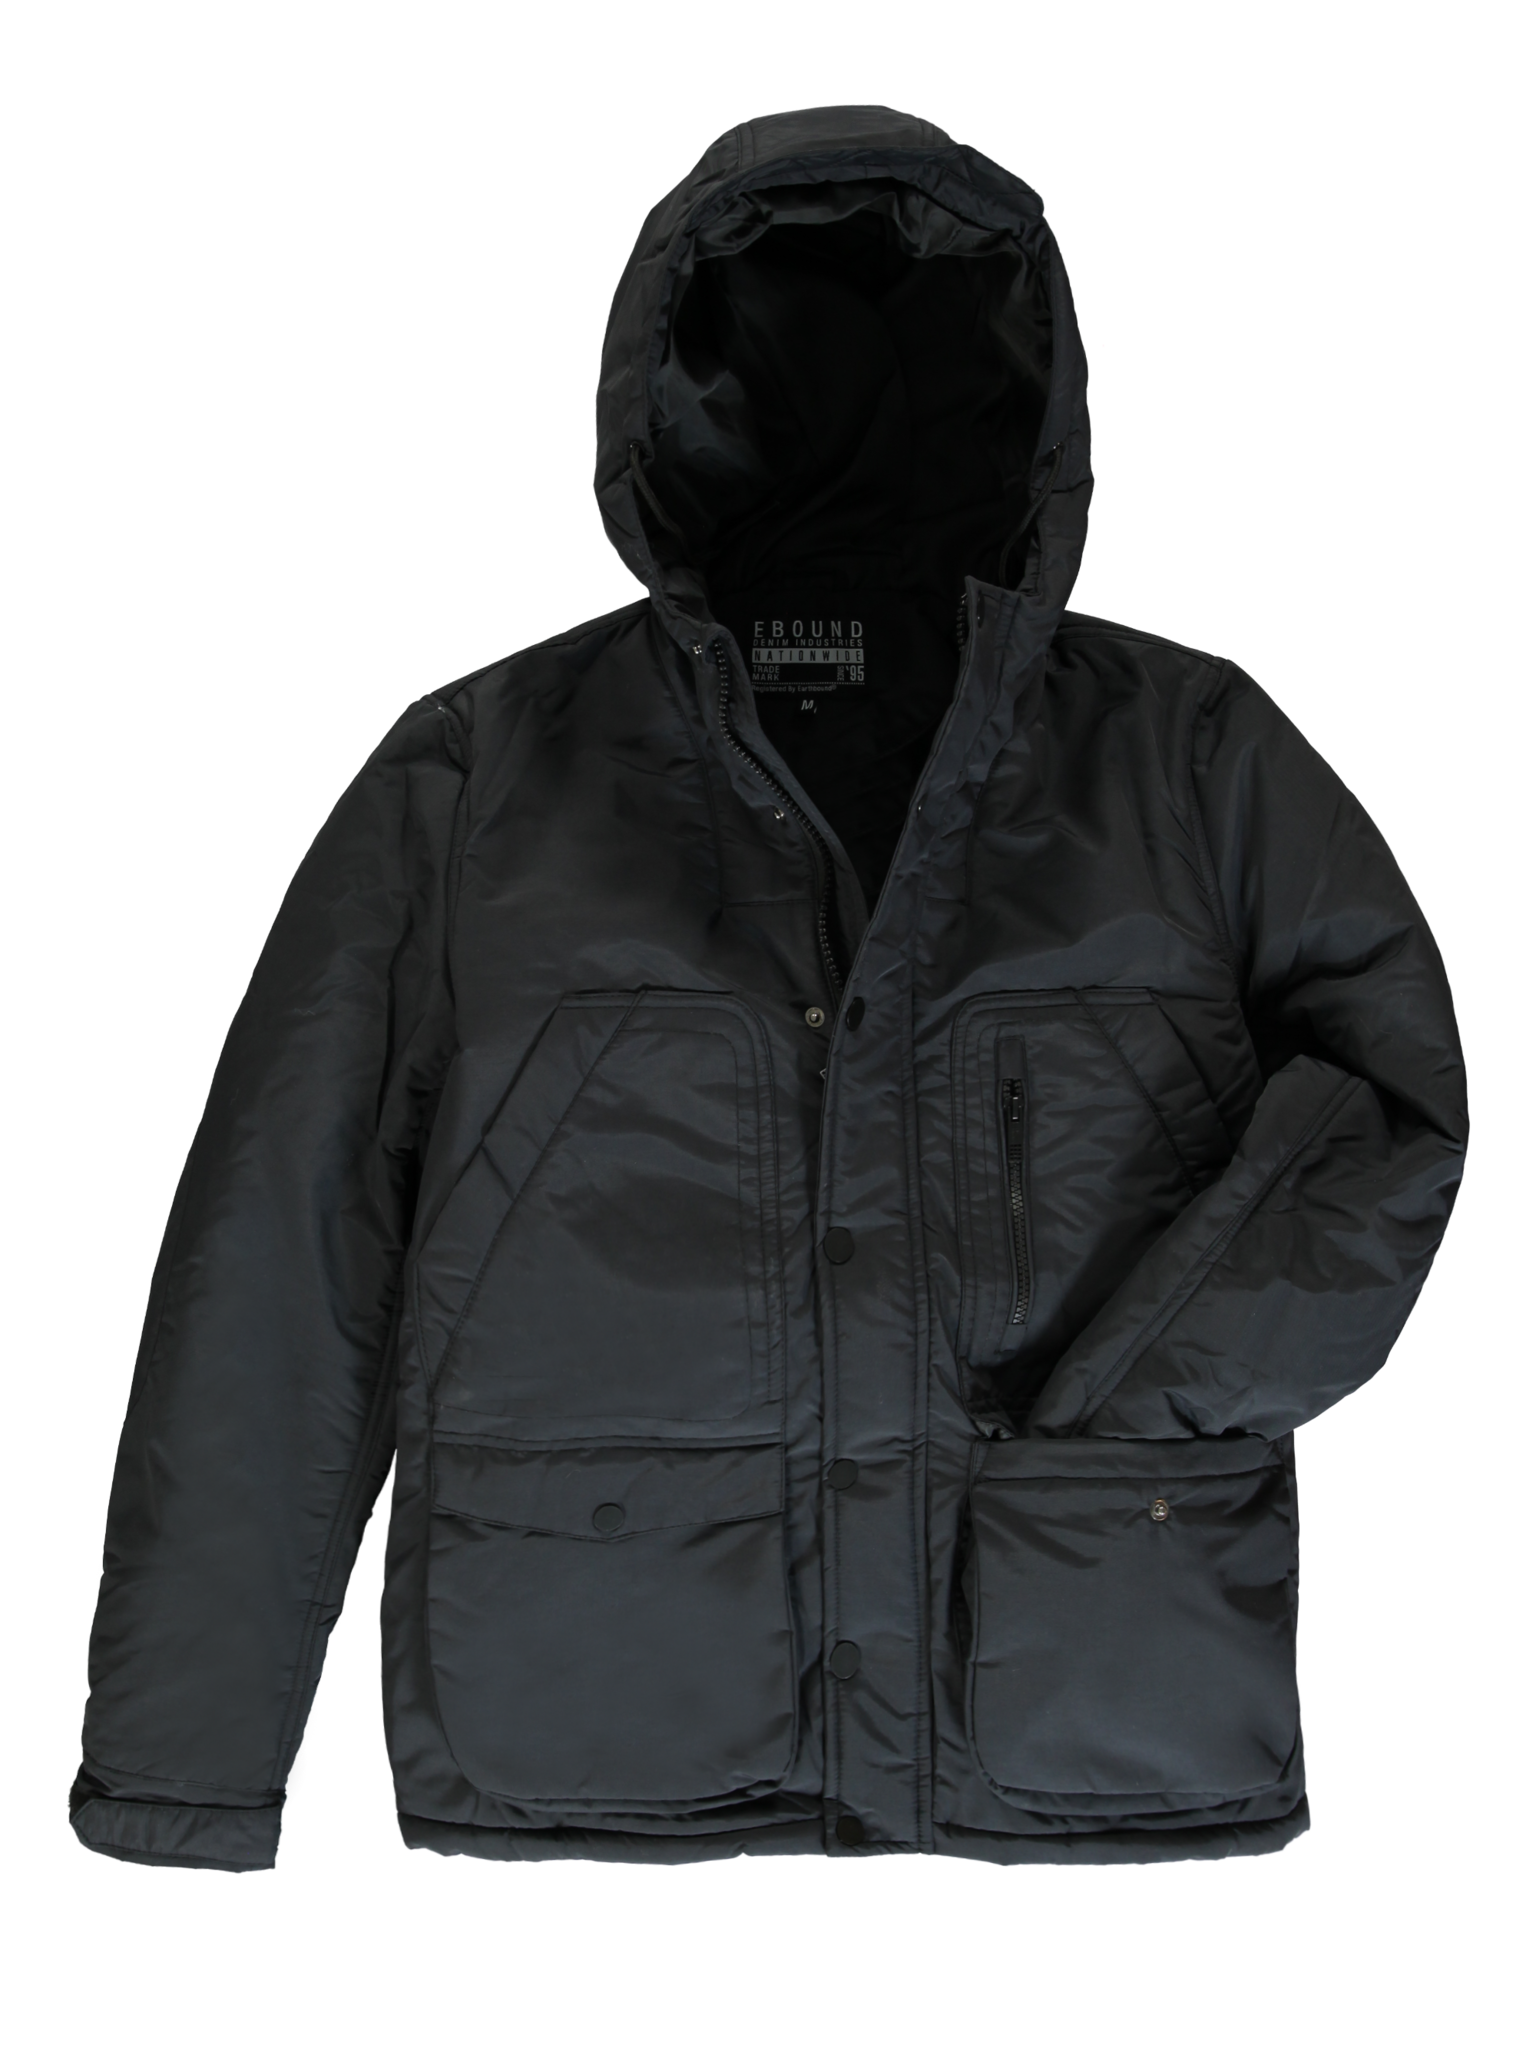 All Brands | Winterproducts Men | Jacket | 14 pcs/box